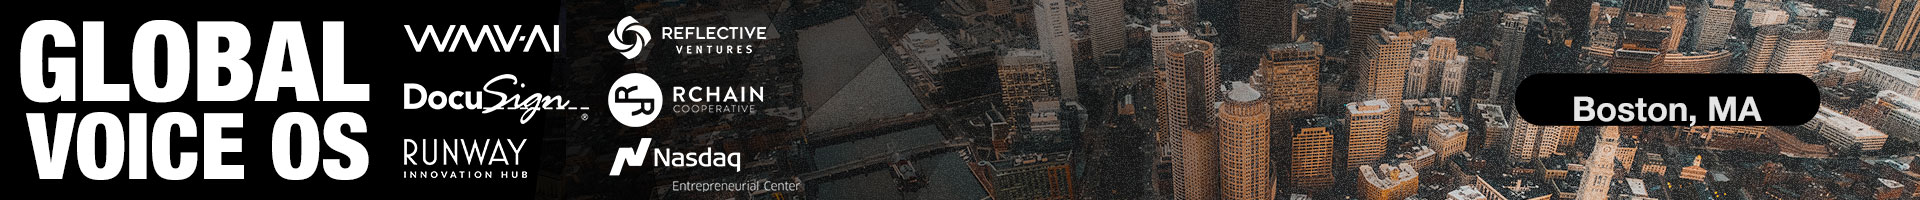 Event-Global-Voice-OS-1920x200-Boston-MA